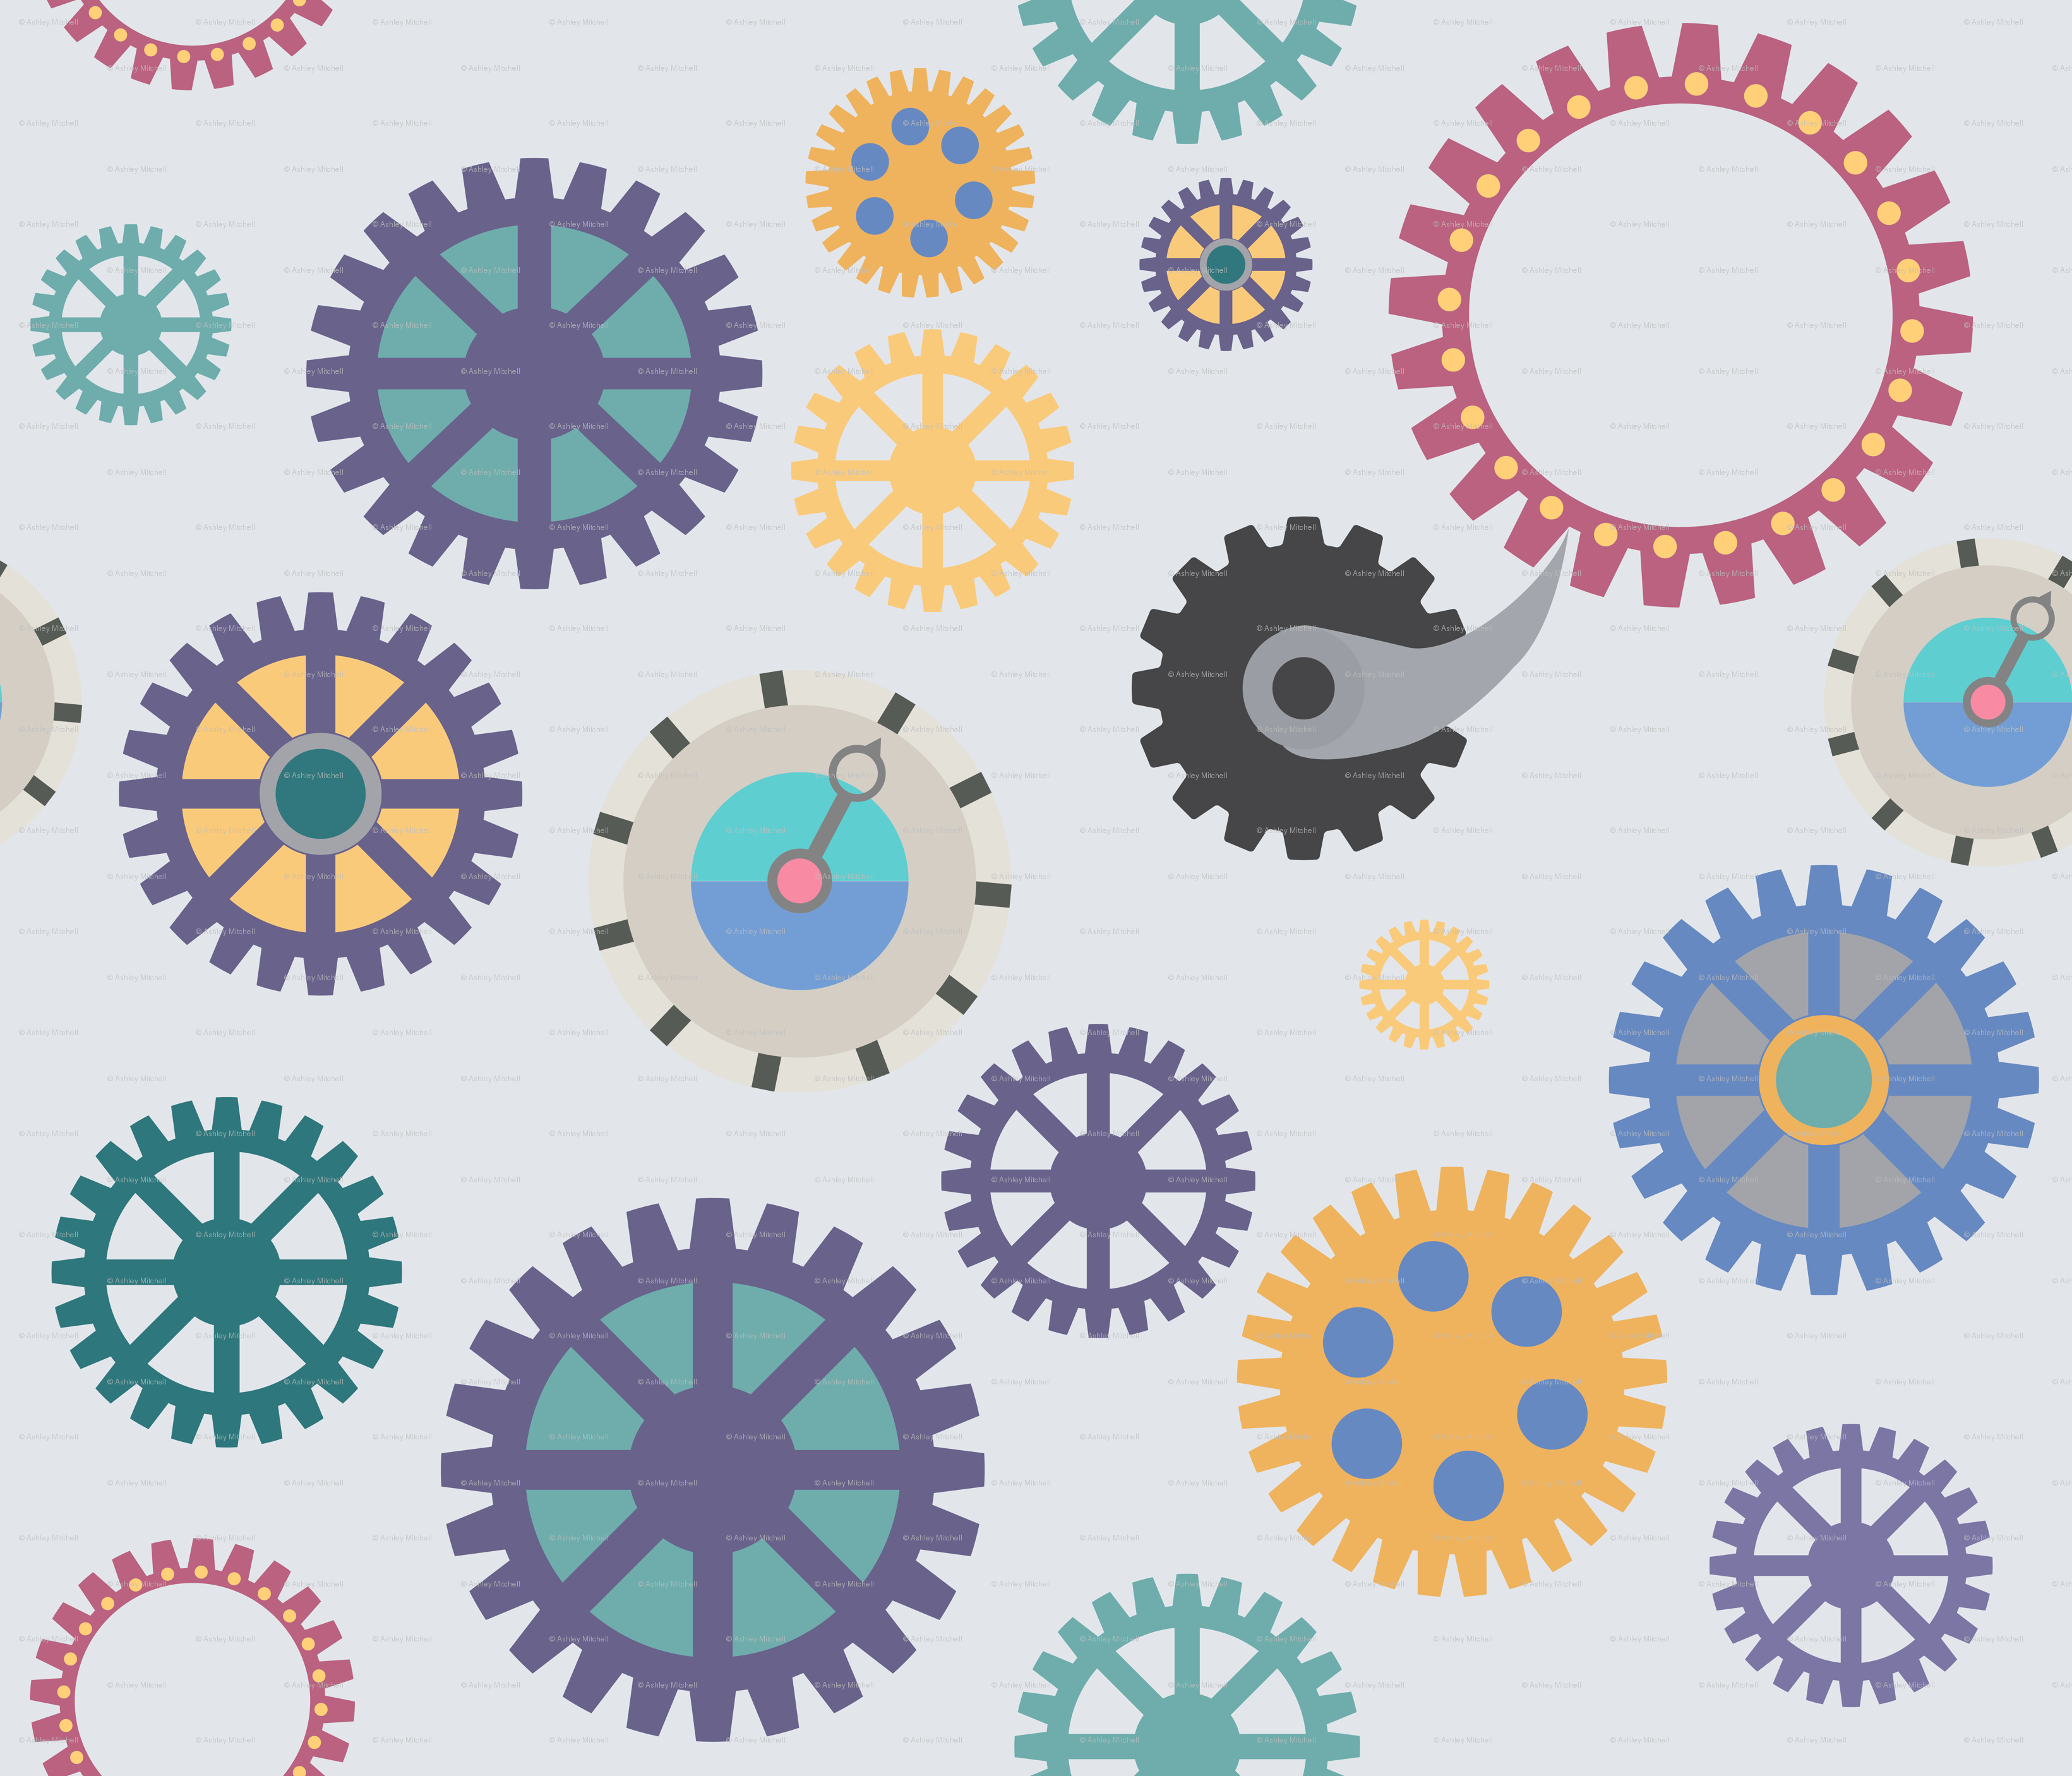 Of gears fabric artgirl. Carousel clipart progress